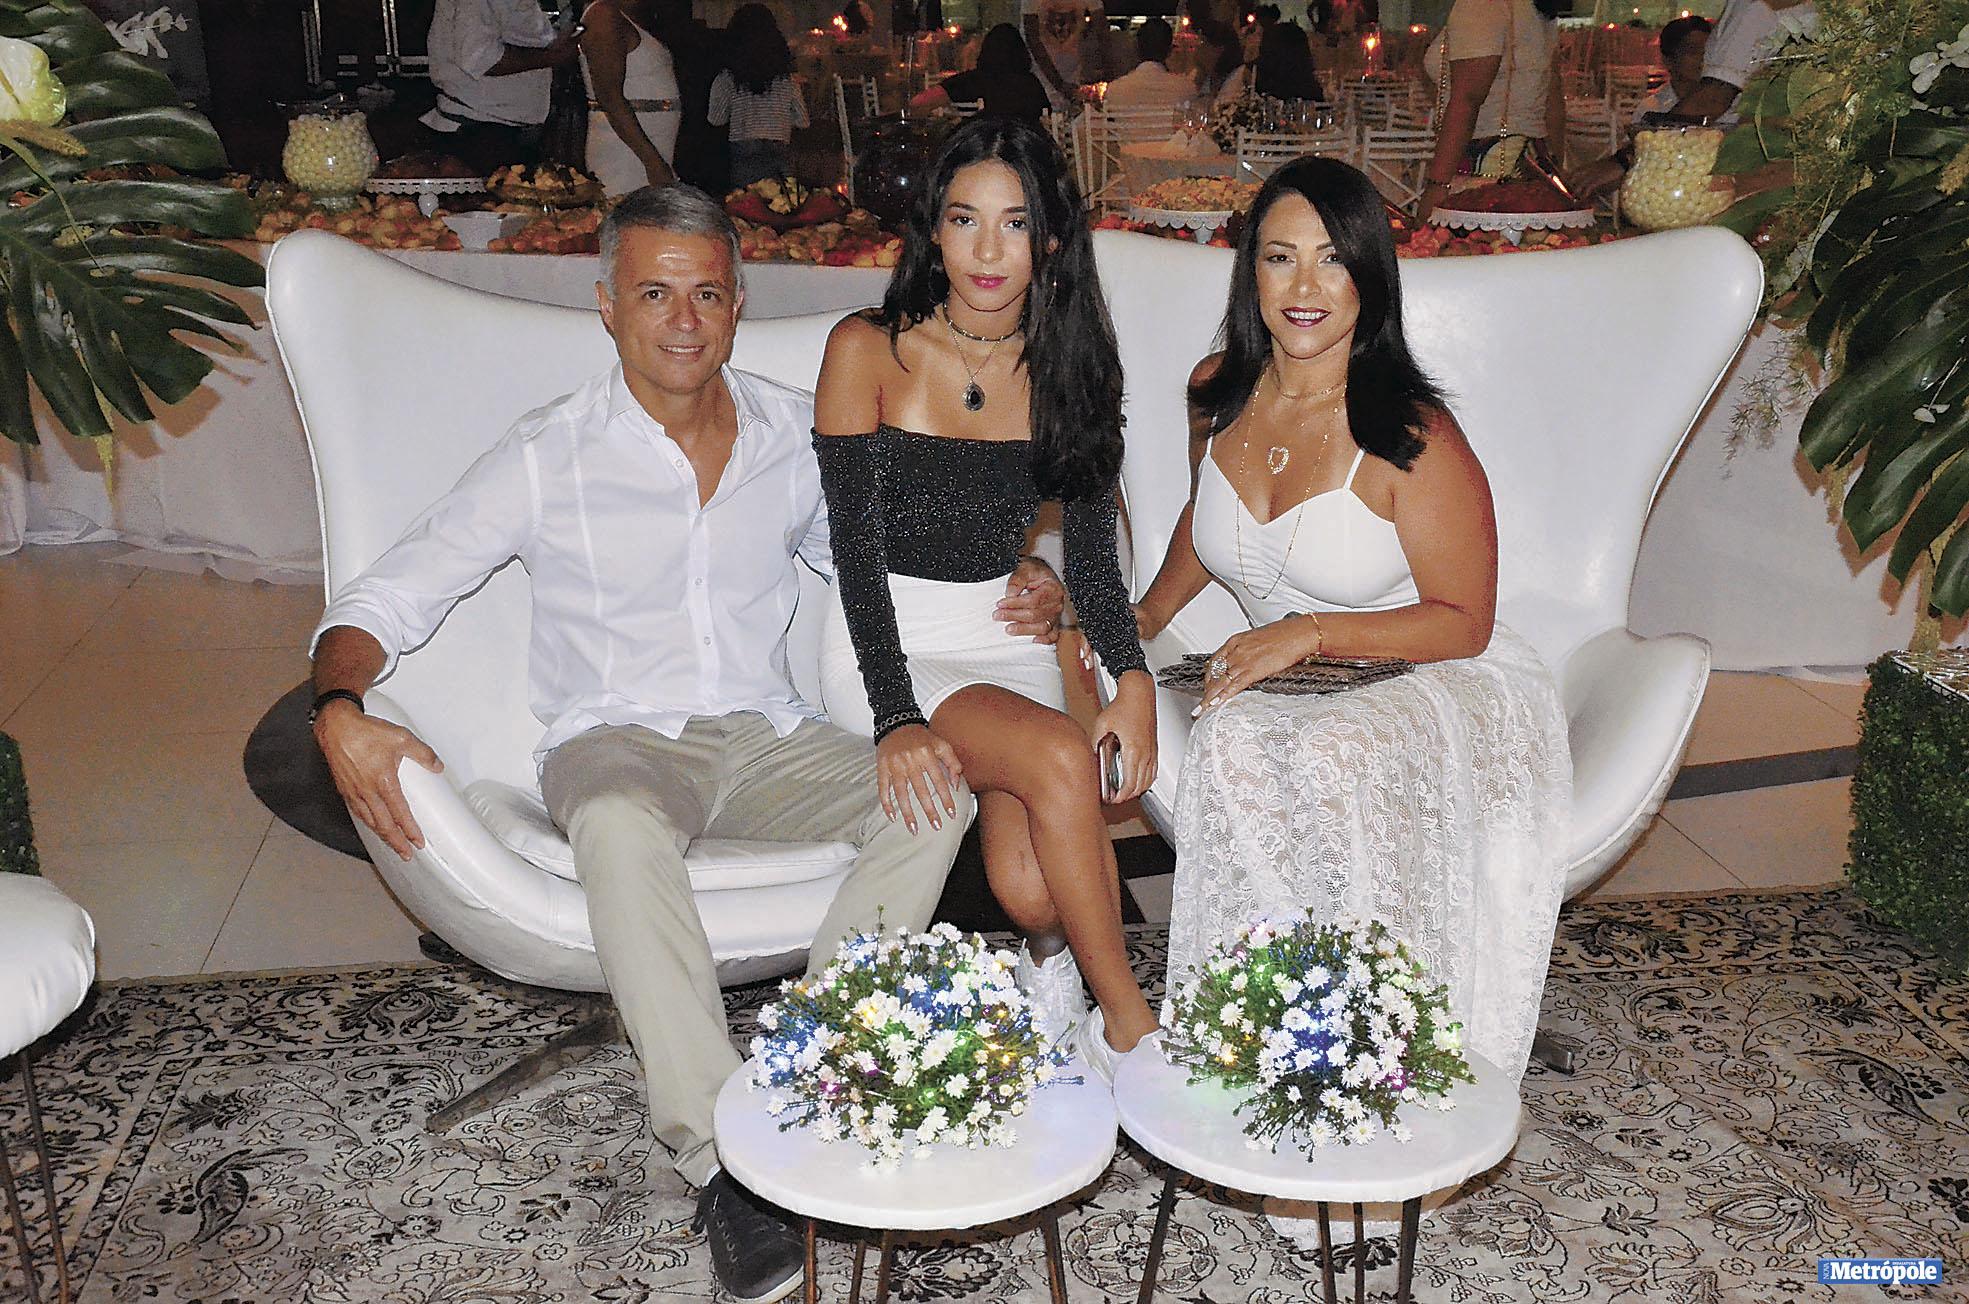 28 - O primeiro tesoureiro do IC, Roberto Carlos da Silva, com a filha Bianca e a esposa Helena no Réveillon 2019 do Indaiatuba Clube